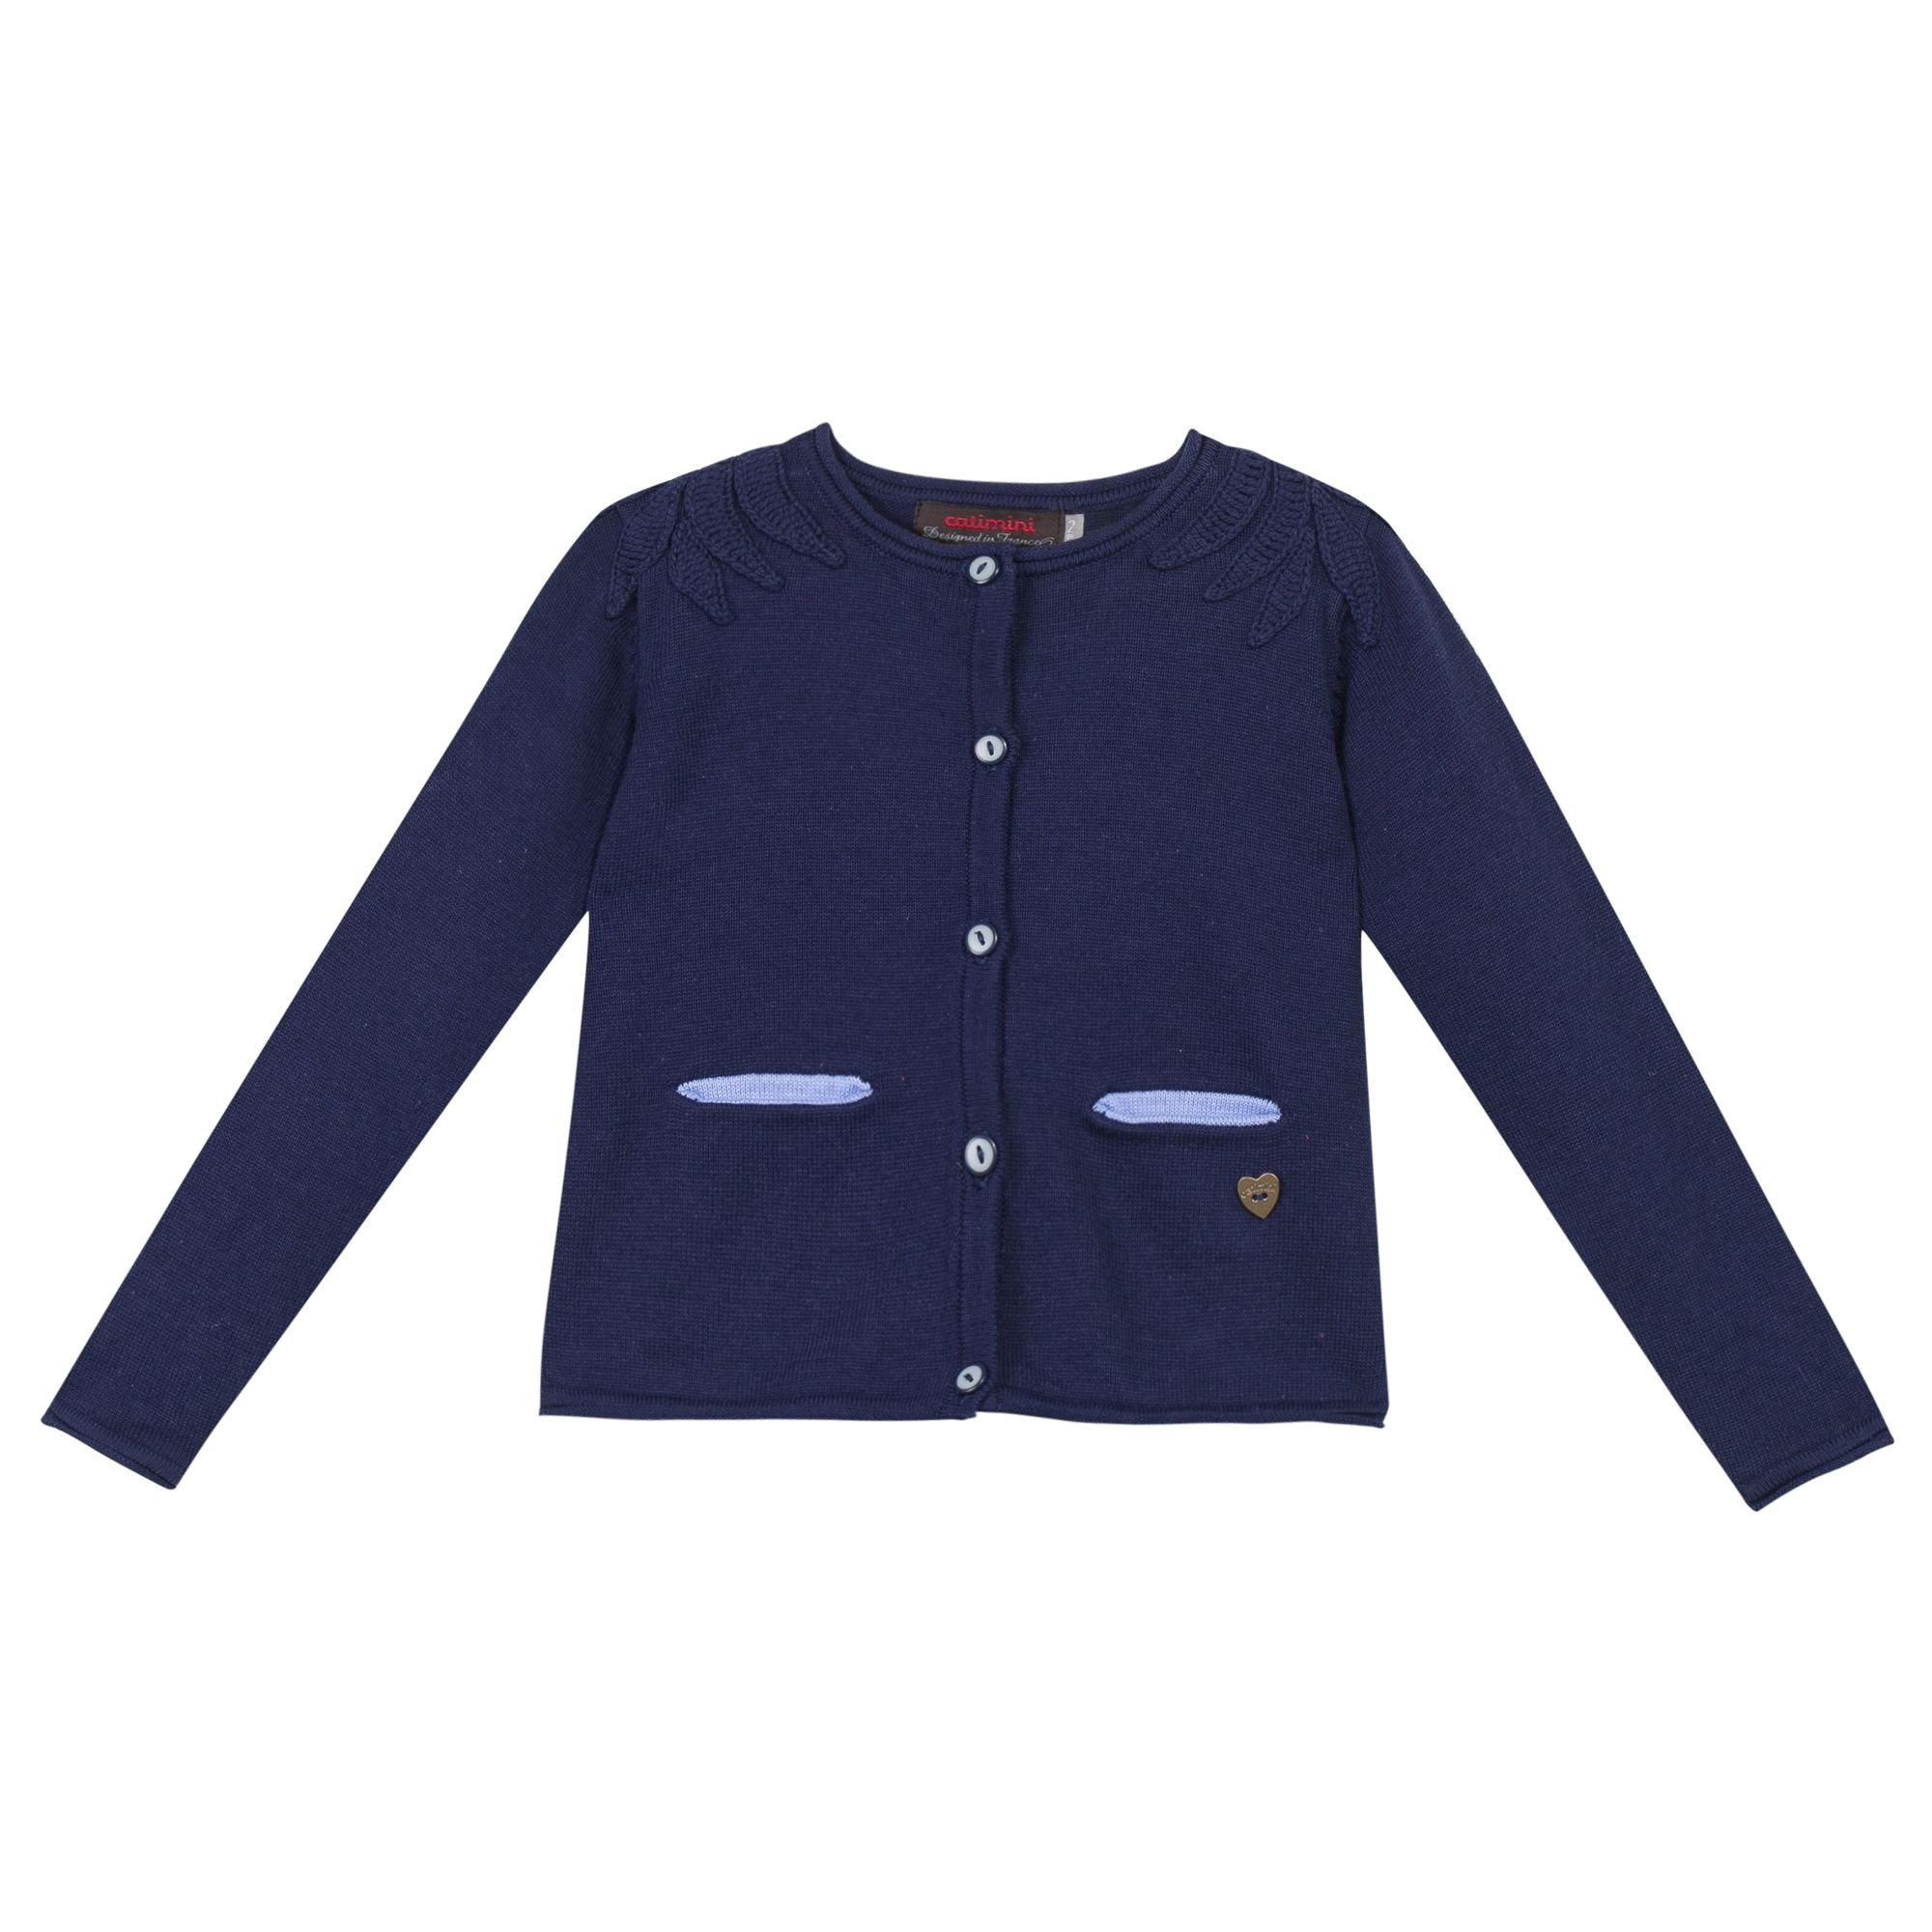 Manteau catimini bleu marine